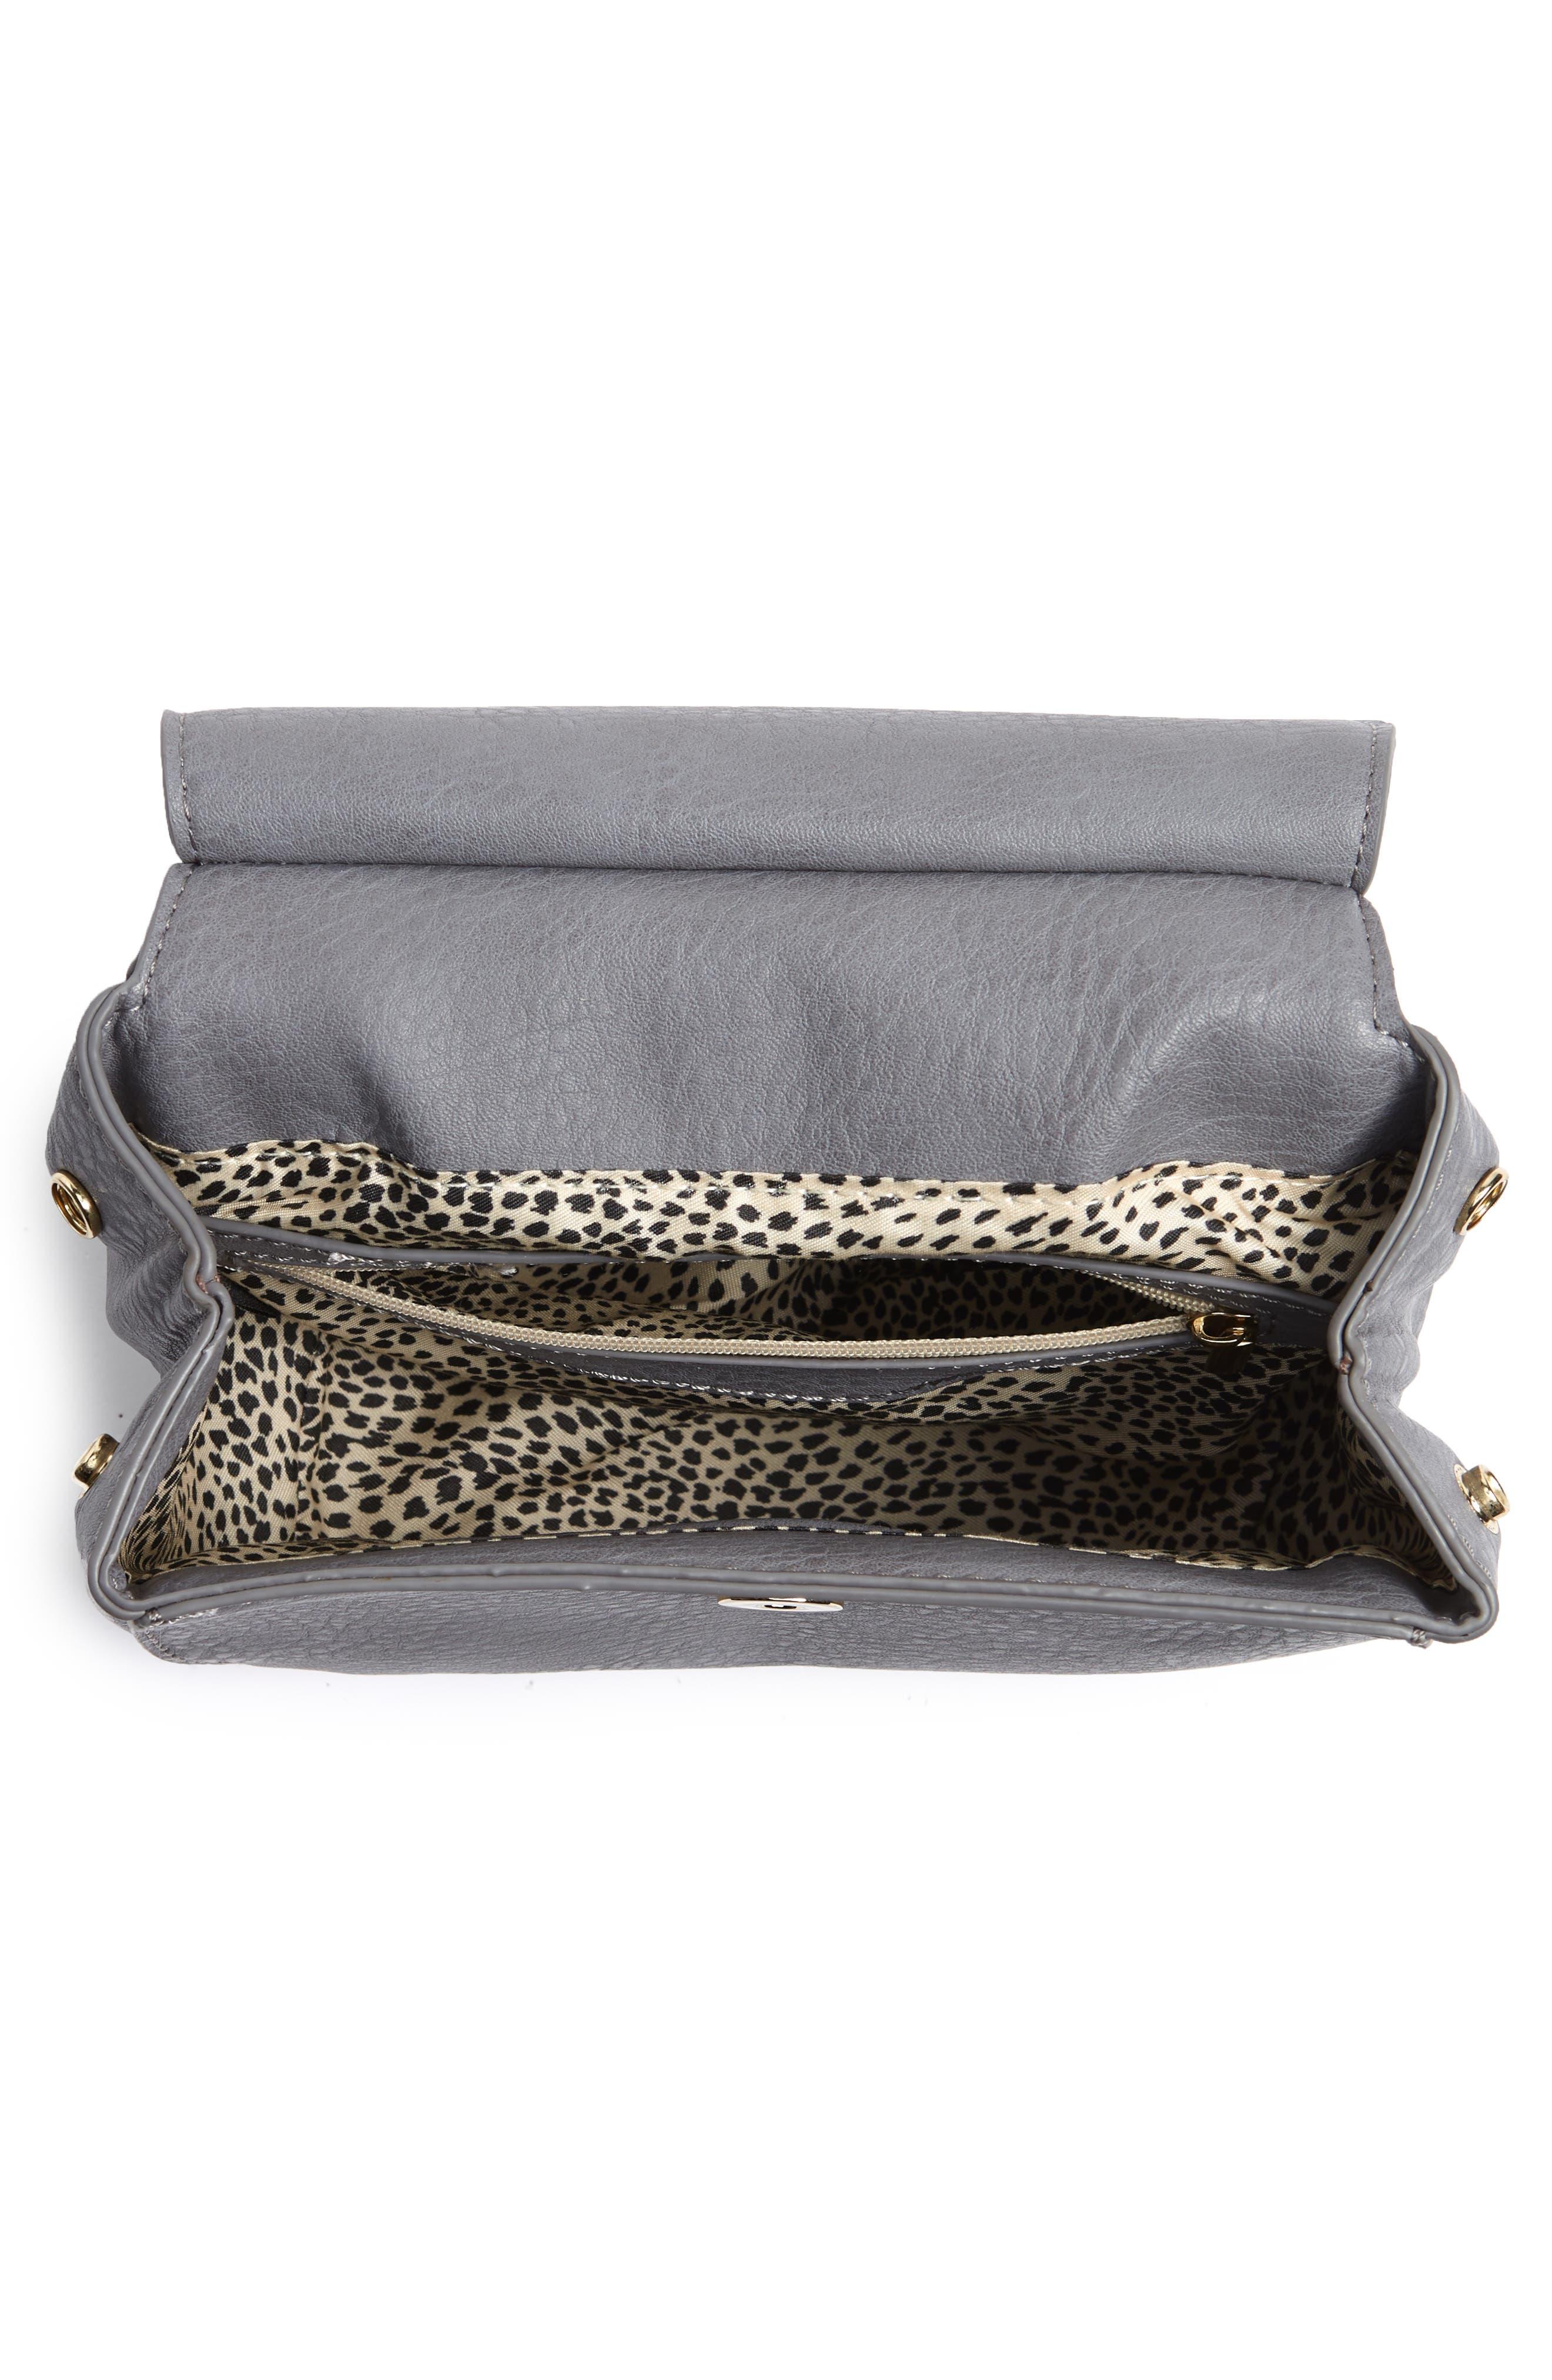 Tassel Faux Leather Crossbody Saddle Bag,                             Alternate thumbnail 4, color,                             Grey